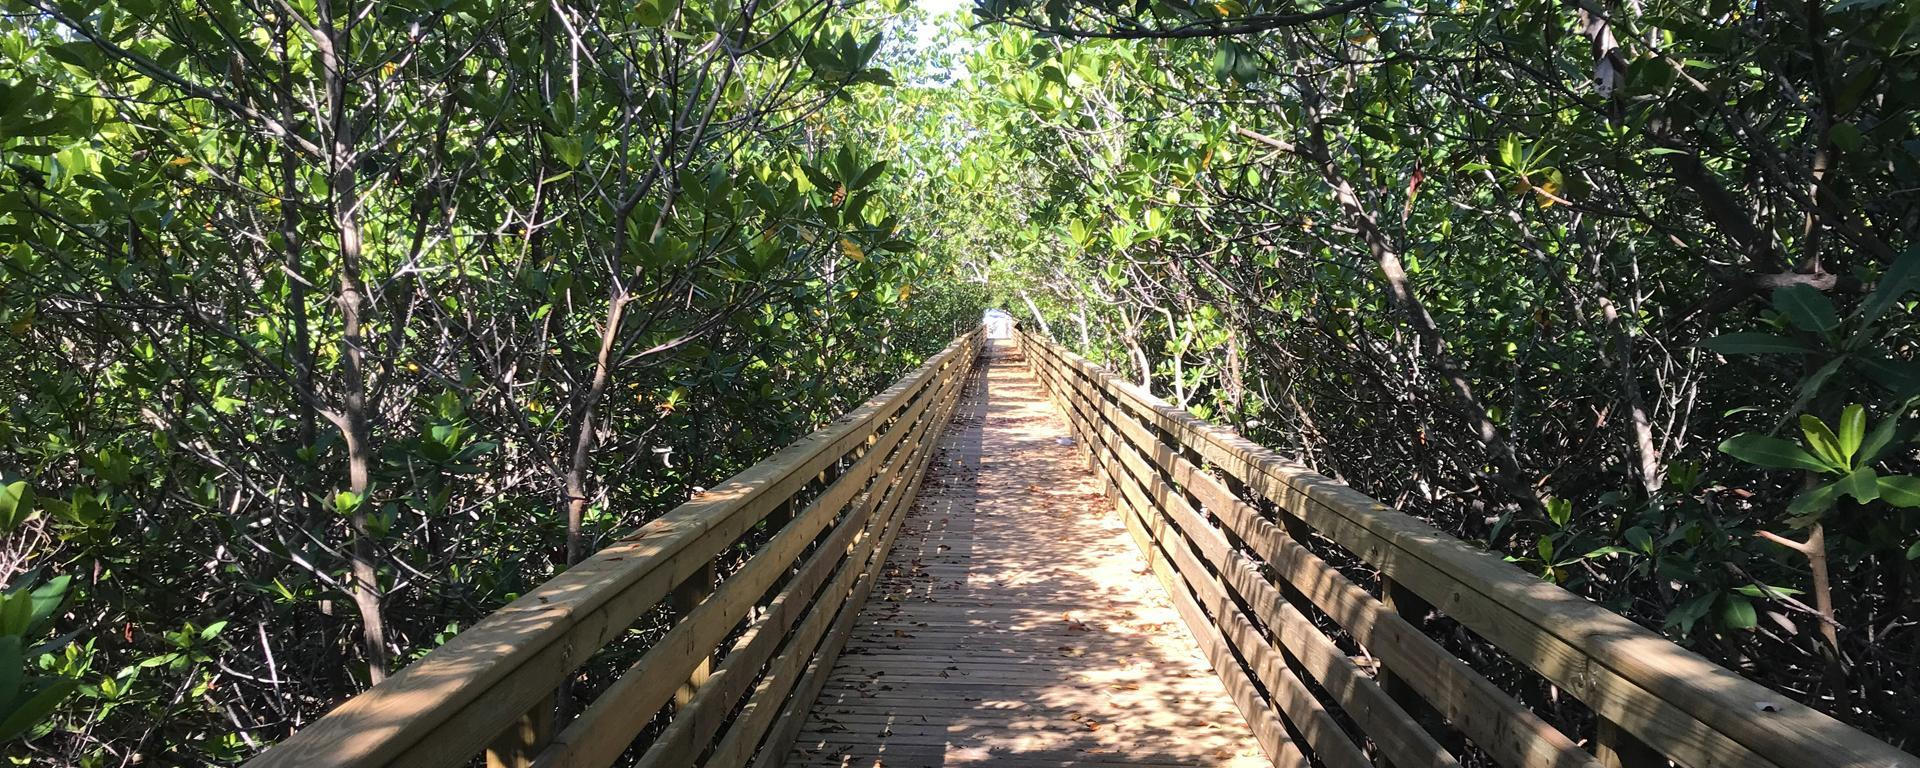 A boardwalk at Clifton S. Perry Beach